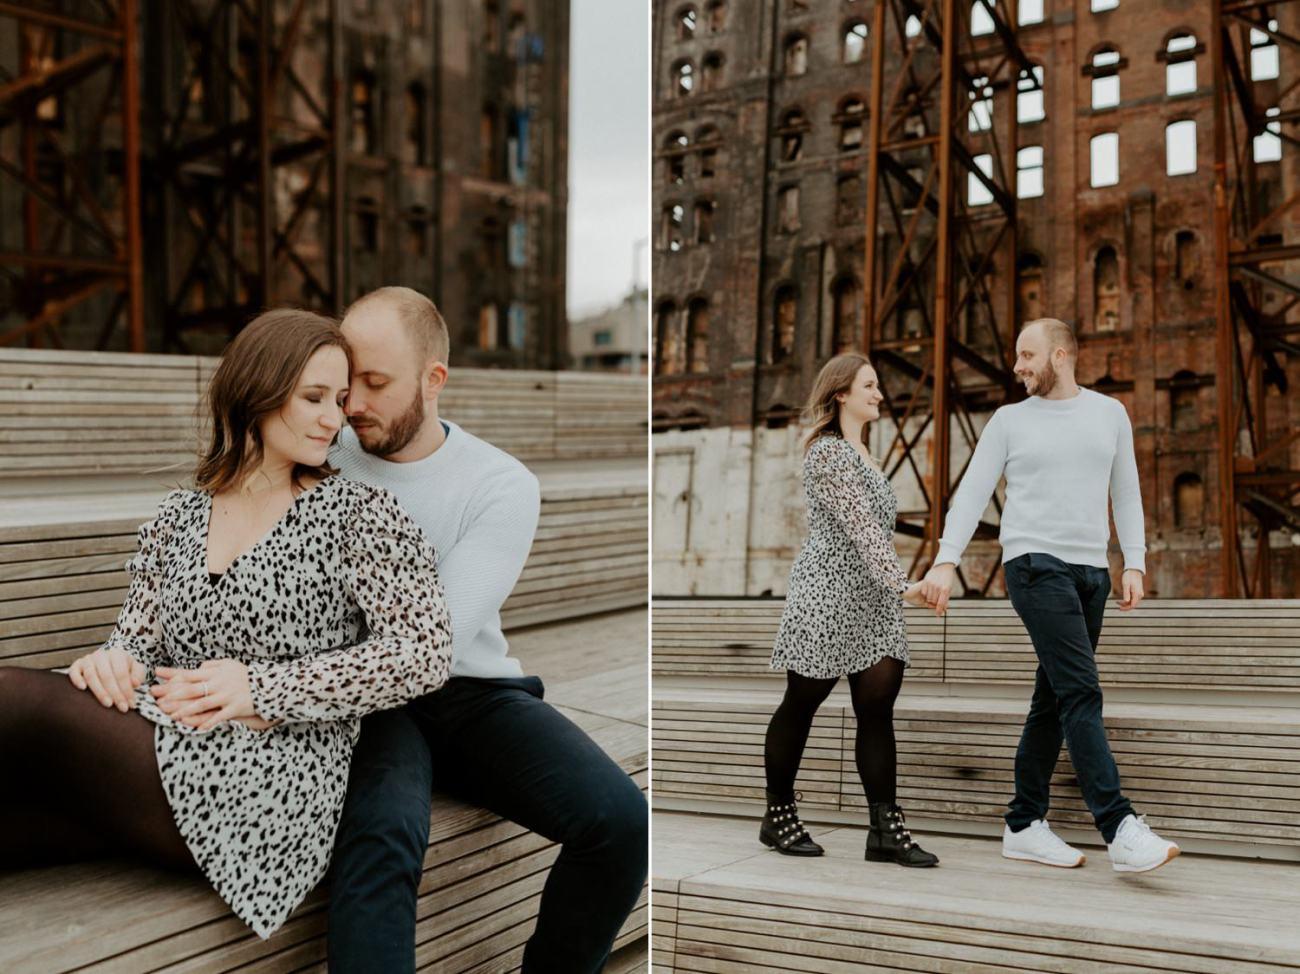 Williamsburg Brooklyn Couple Session Brooklyn Bridge Couple Photos Anais Possamai Photography 16